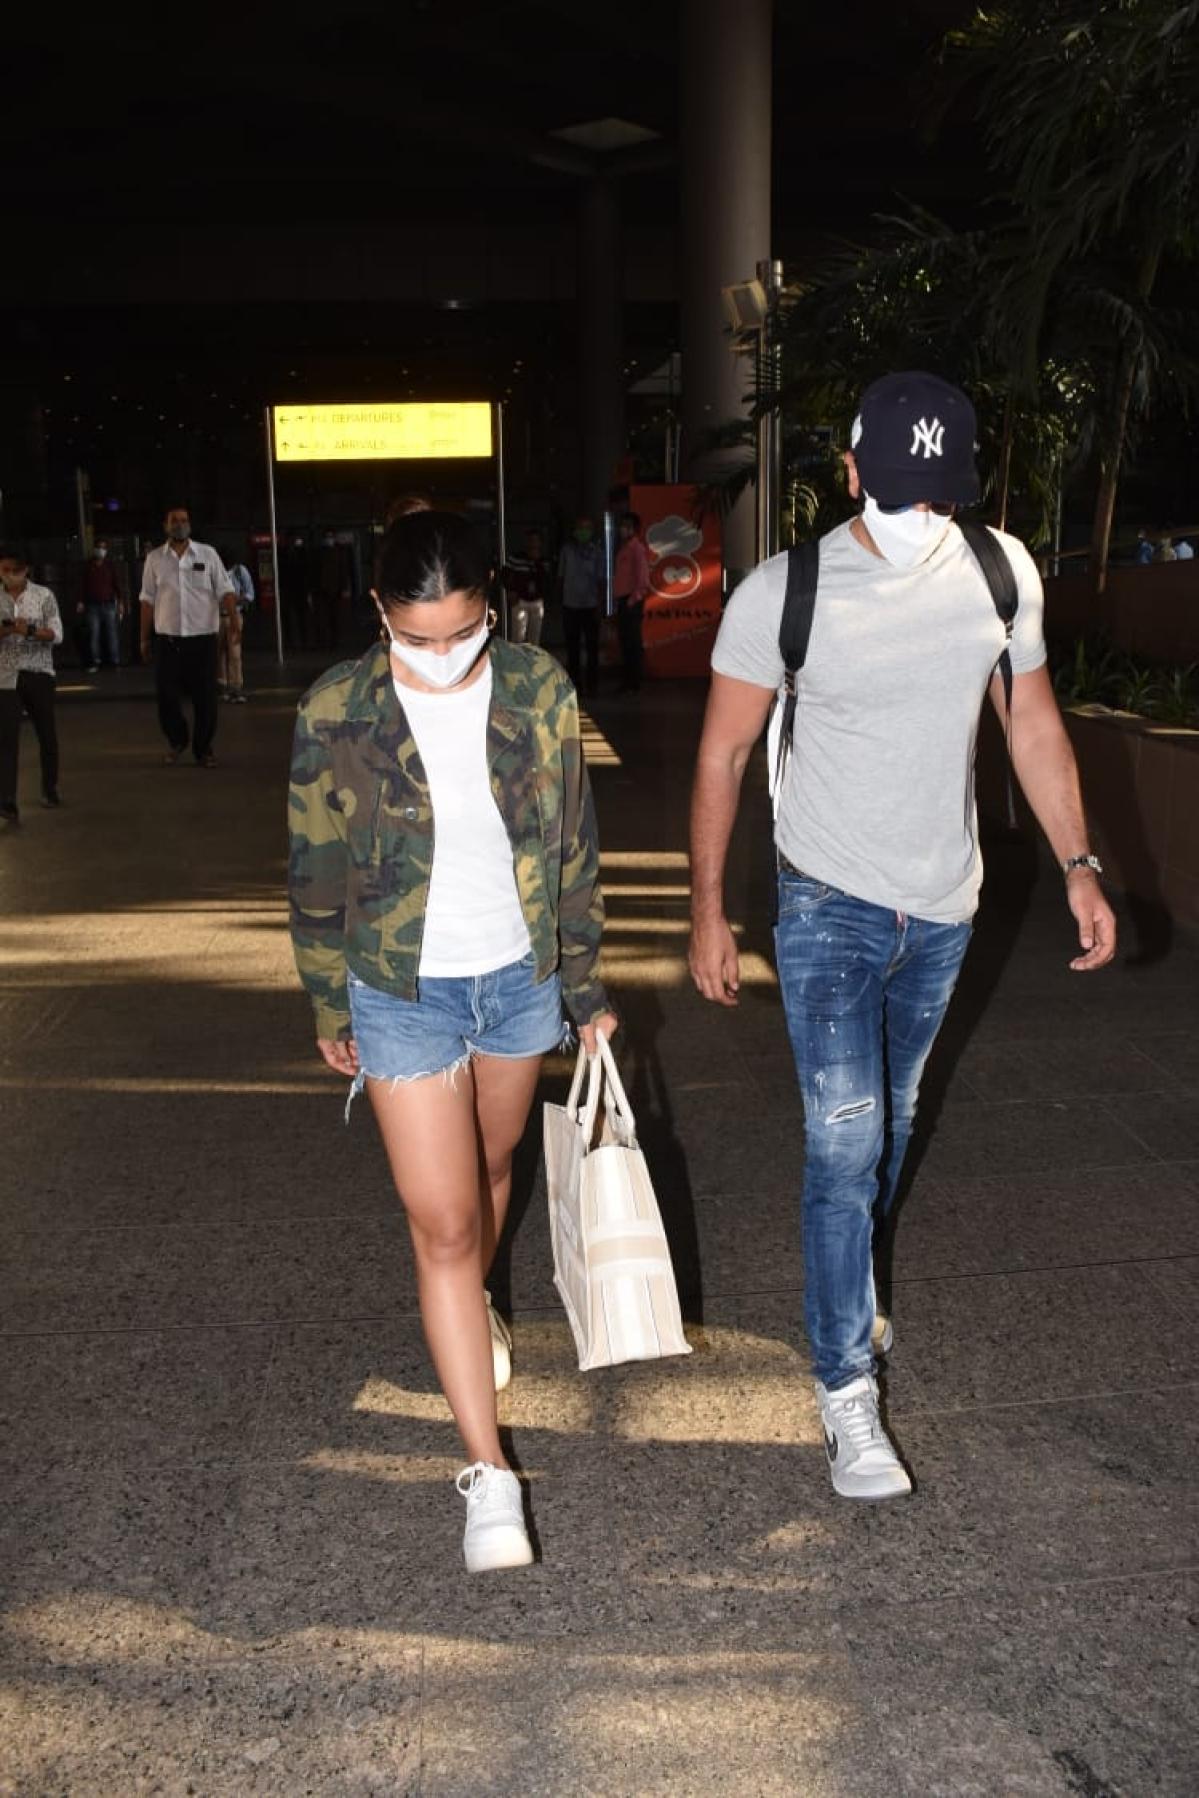 In Pics: Ranbir-Alia and Tiger-Disha arrive in Mumbai after their Maldives 'baecation' amid COVID-19 pandemic